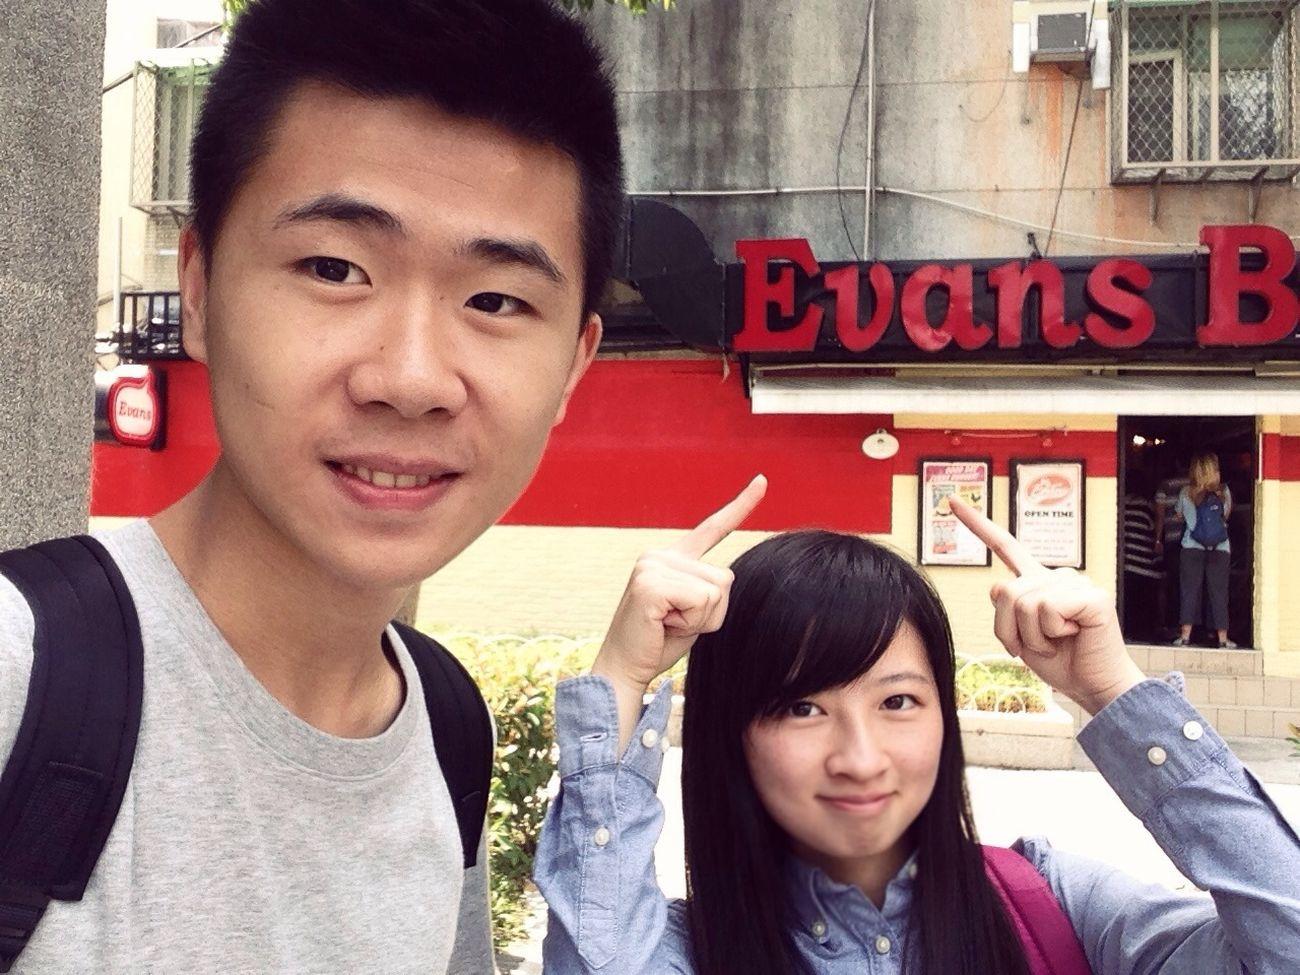 Evans Burgers Yummy